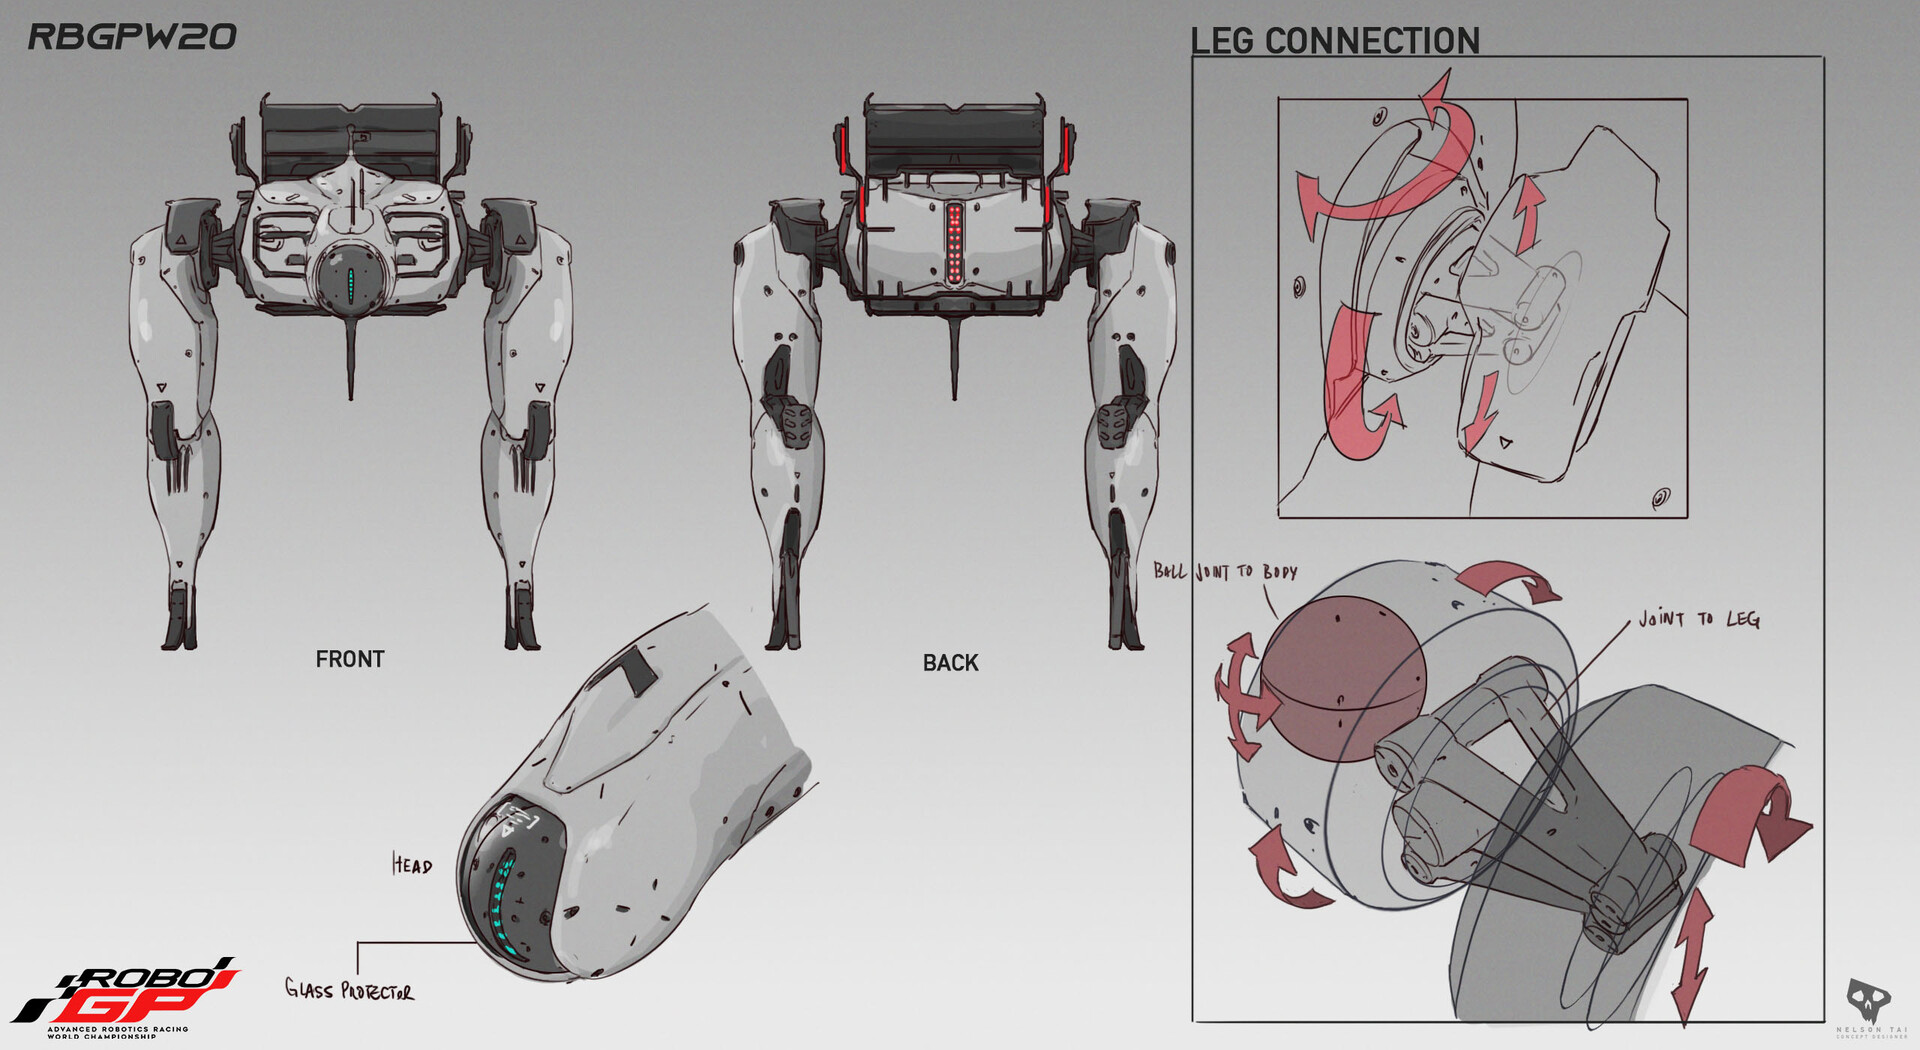 Making sense of the legs